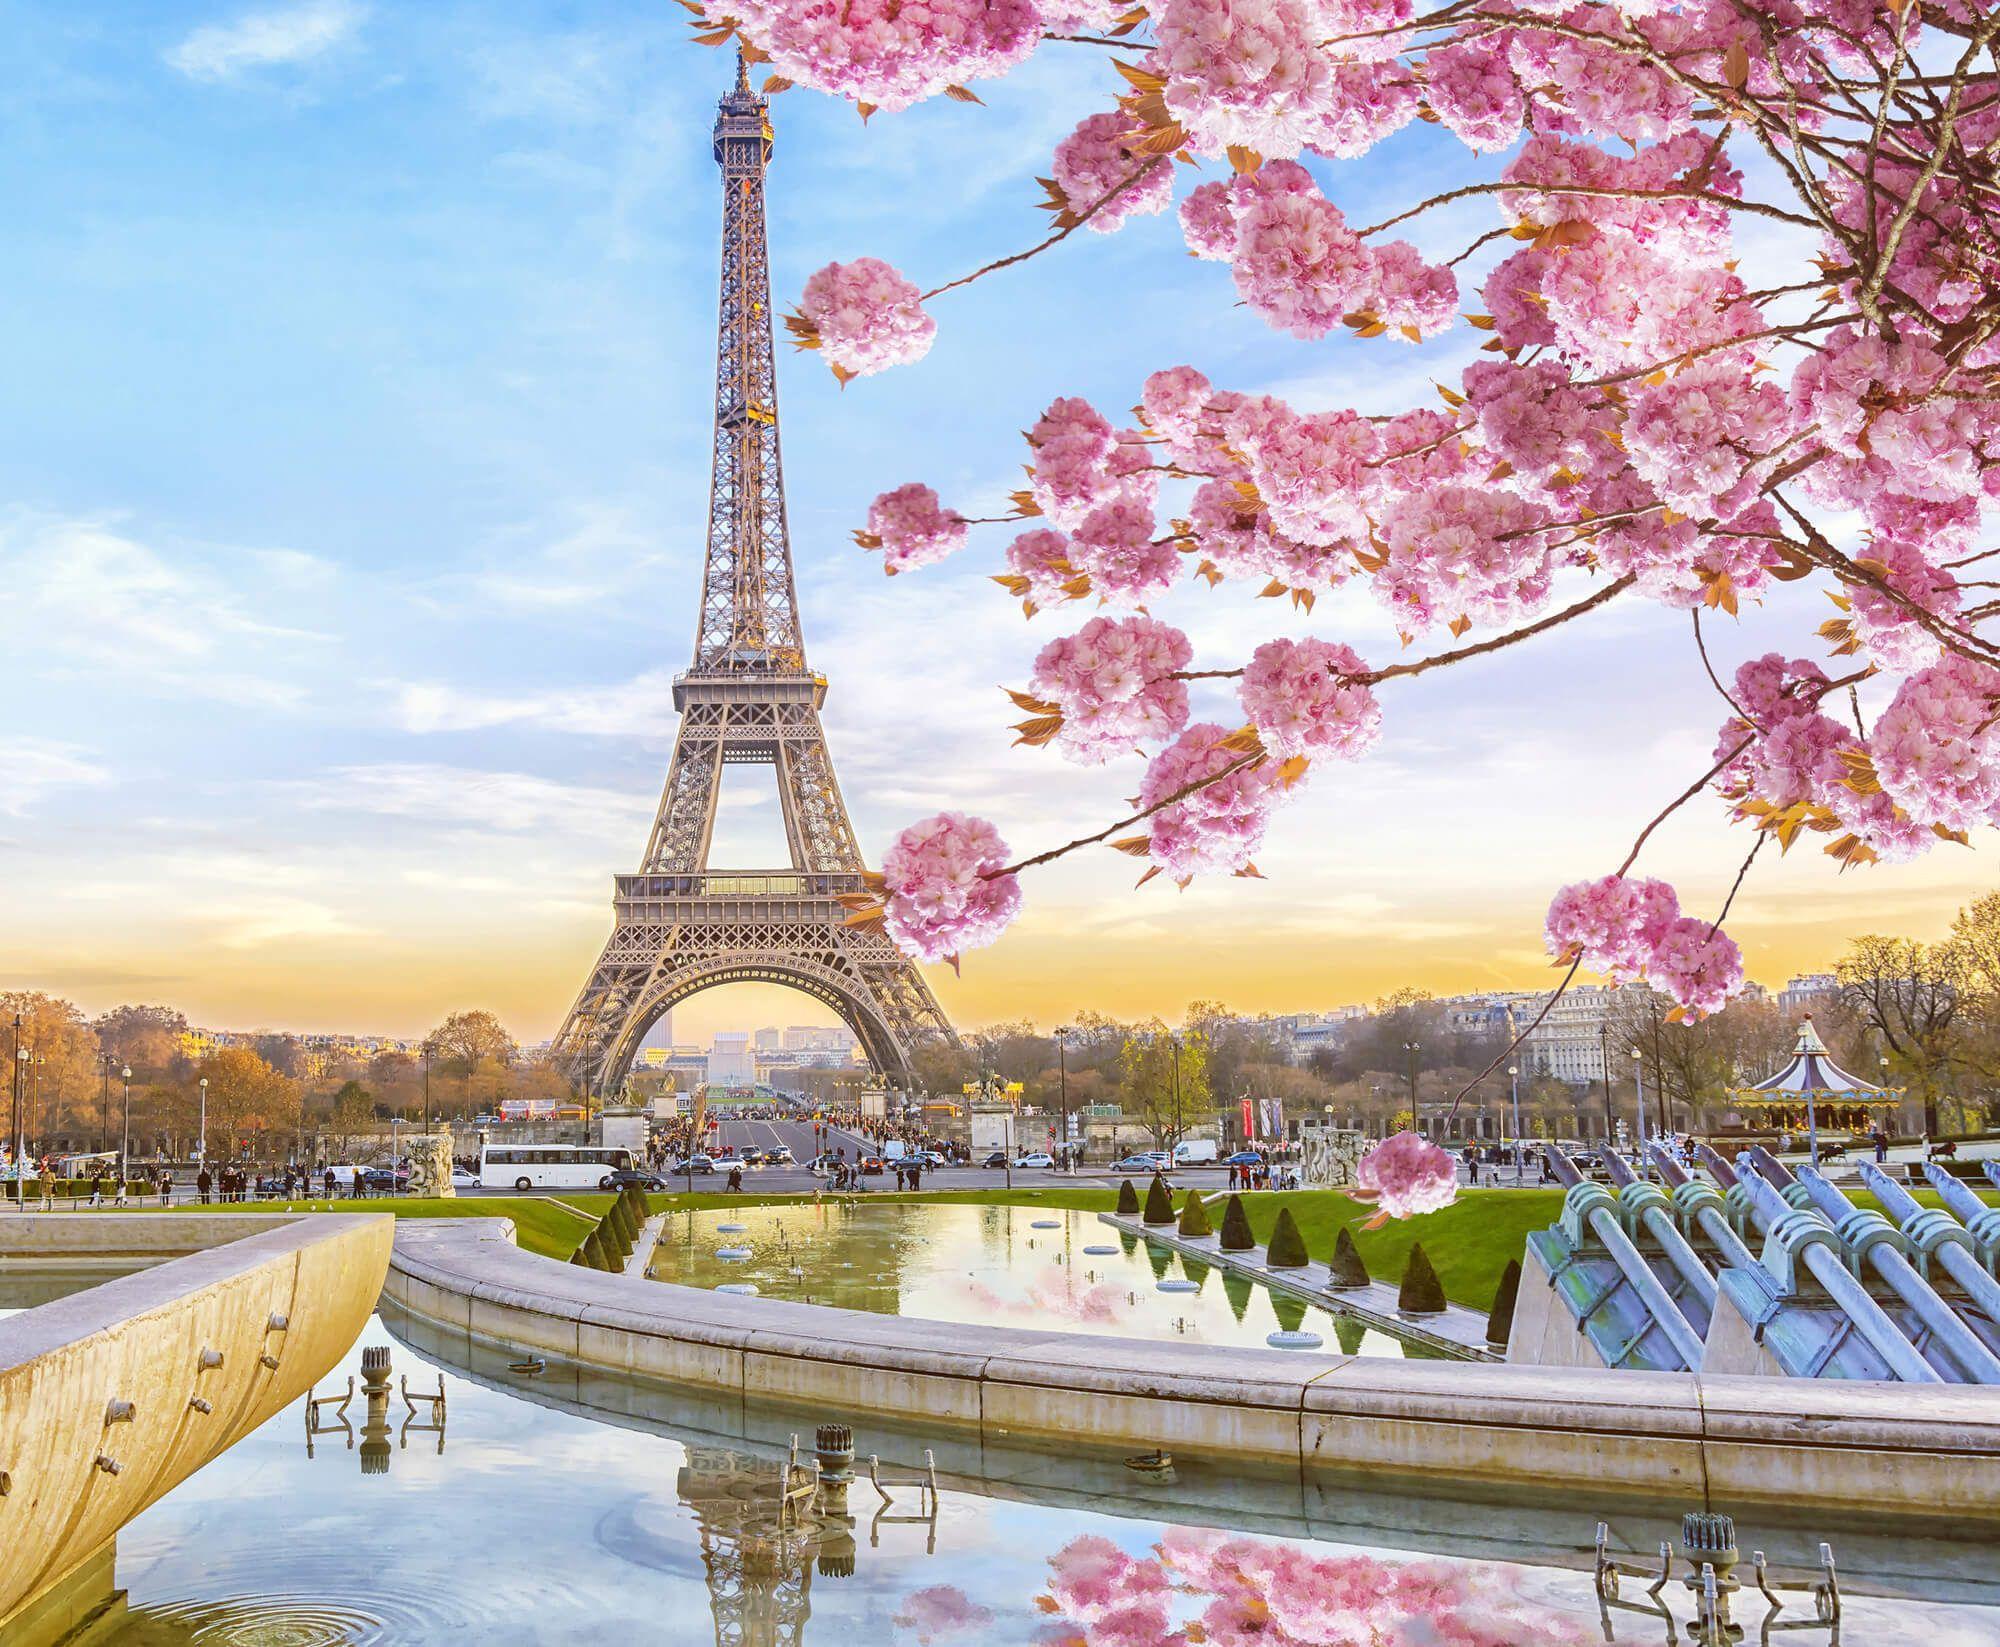 Sasi Wallpaper Eiffel Tower Cherry Blossobum Eiffel Tower Tourist Trap Eiffel Tower At Night